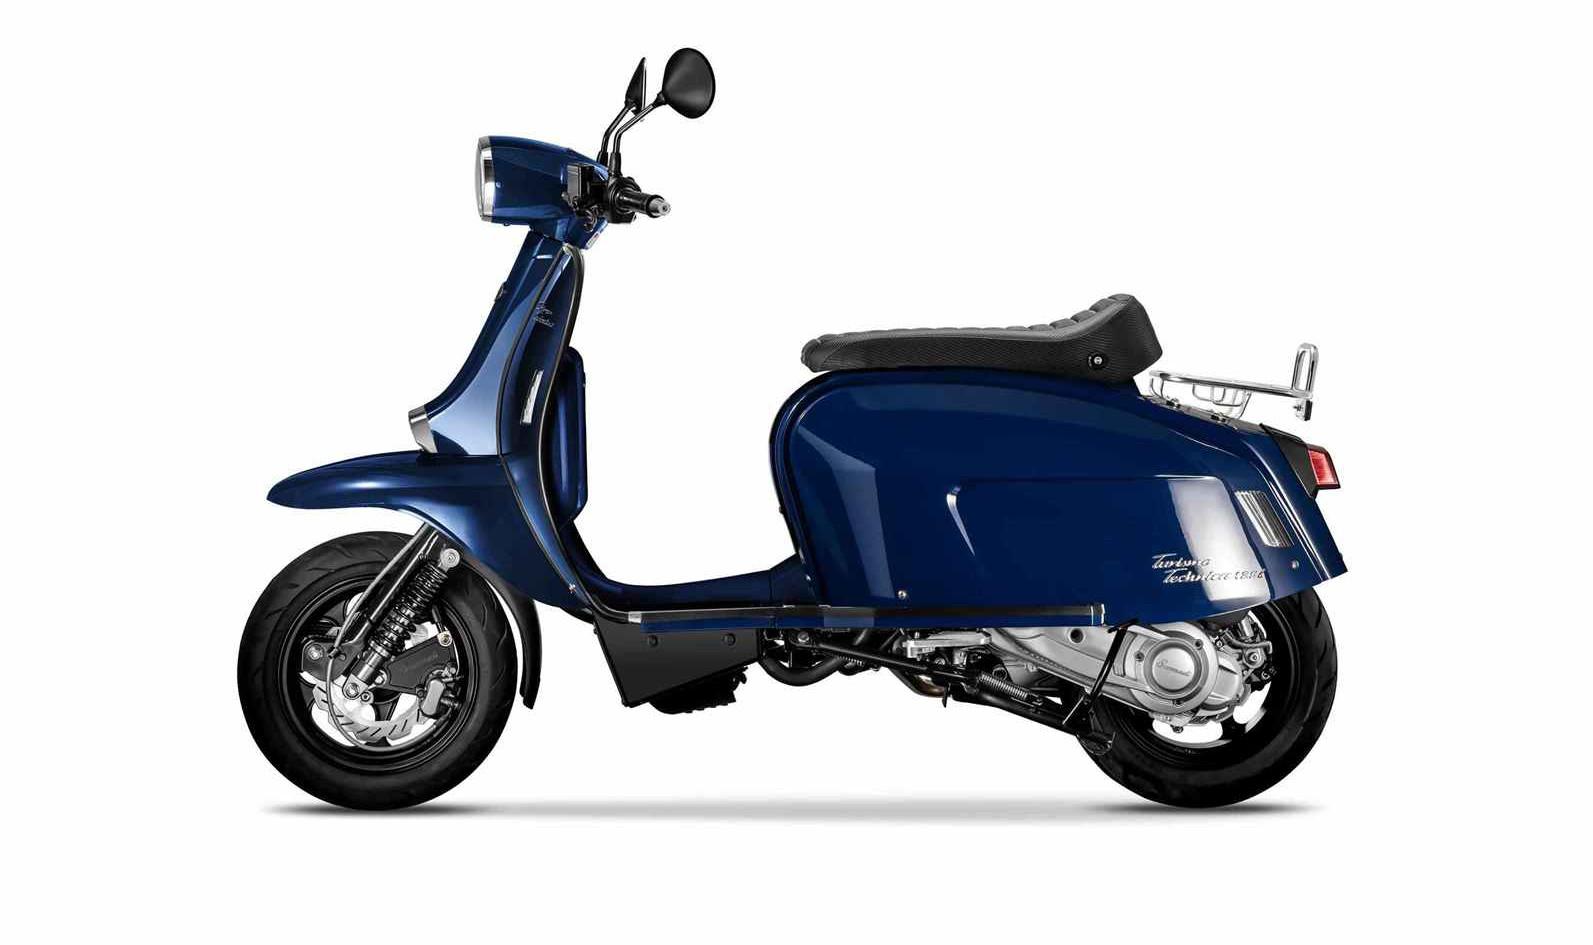 Scomadi_200cc_Jan2019_Side_Blue-1-1.jpg